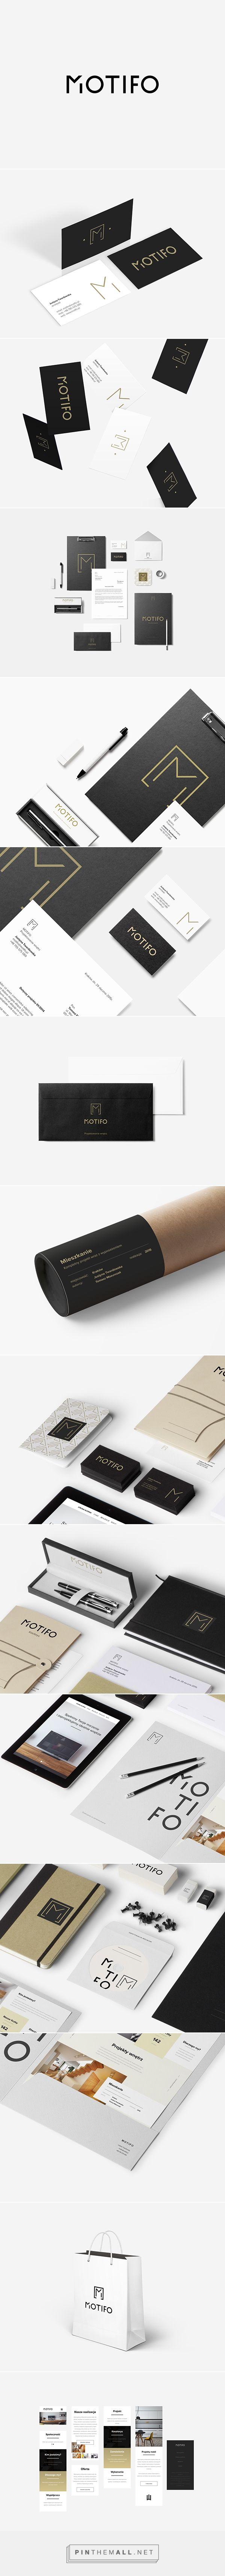 MOTIFO - Interior Design Architect | Branding & Website